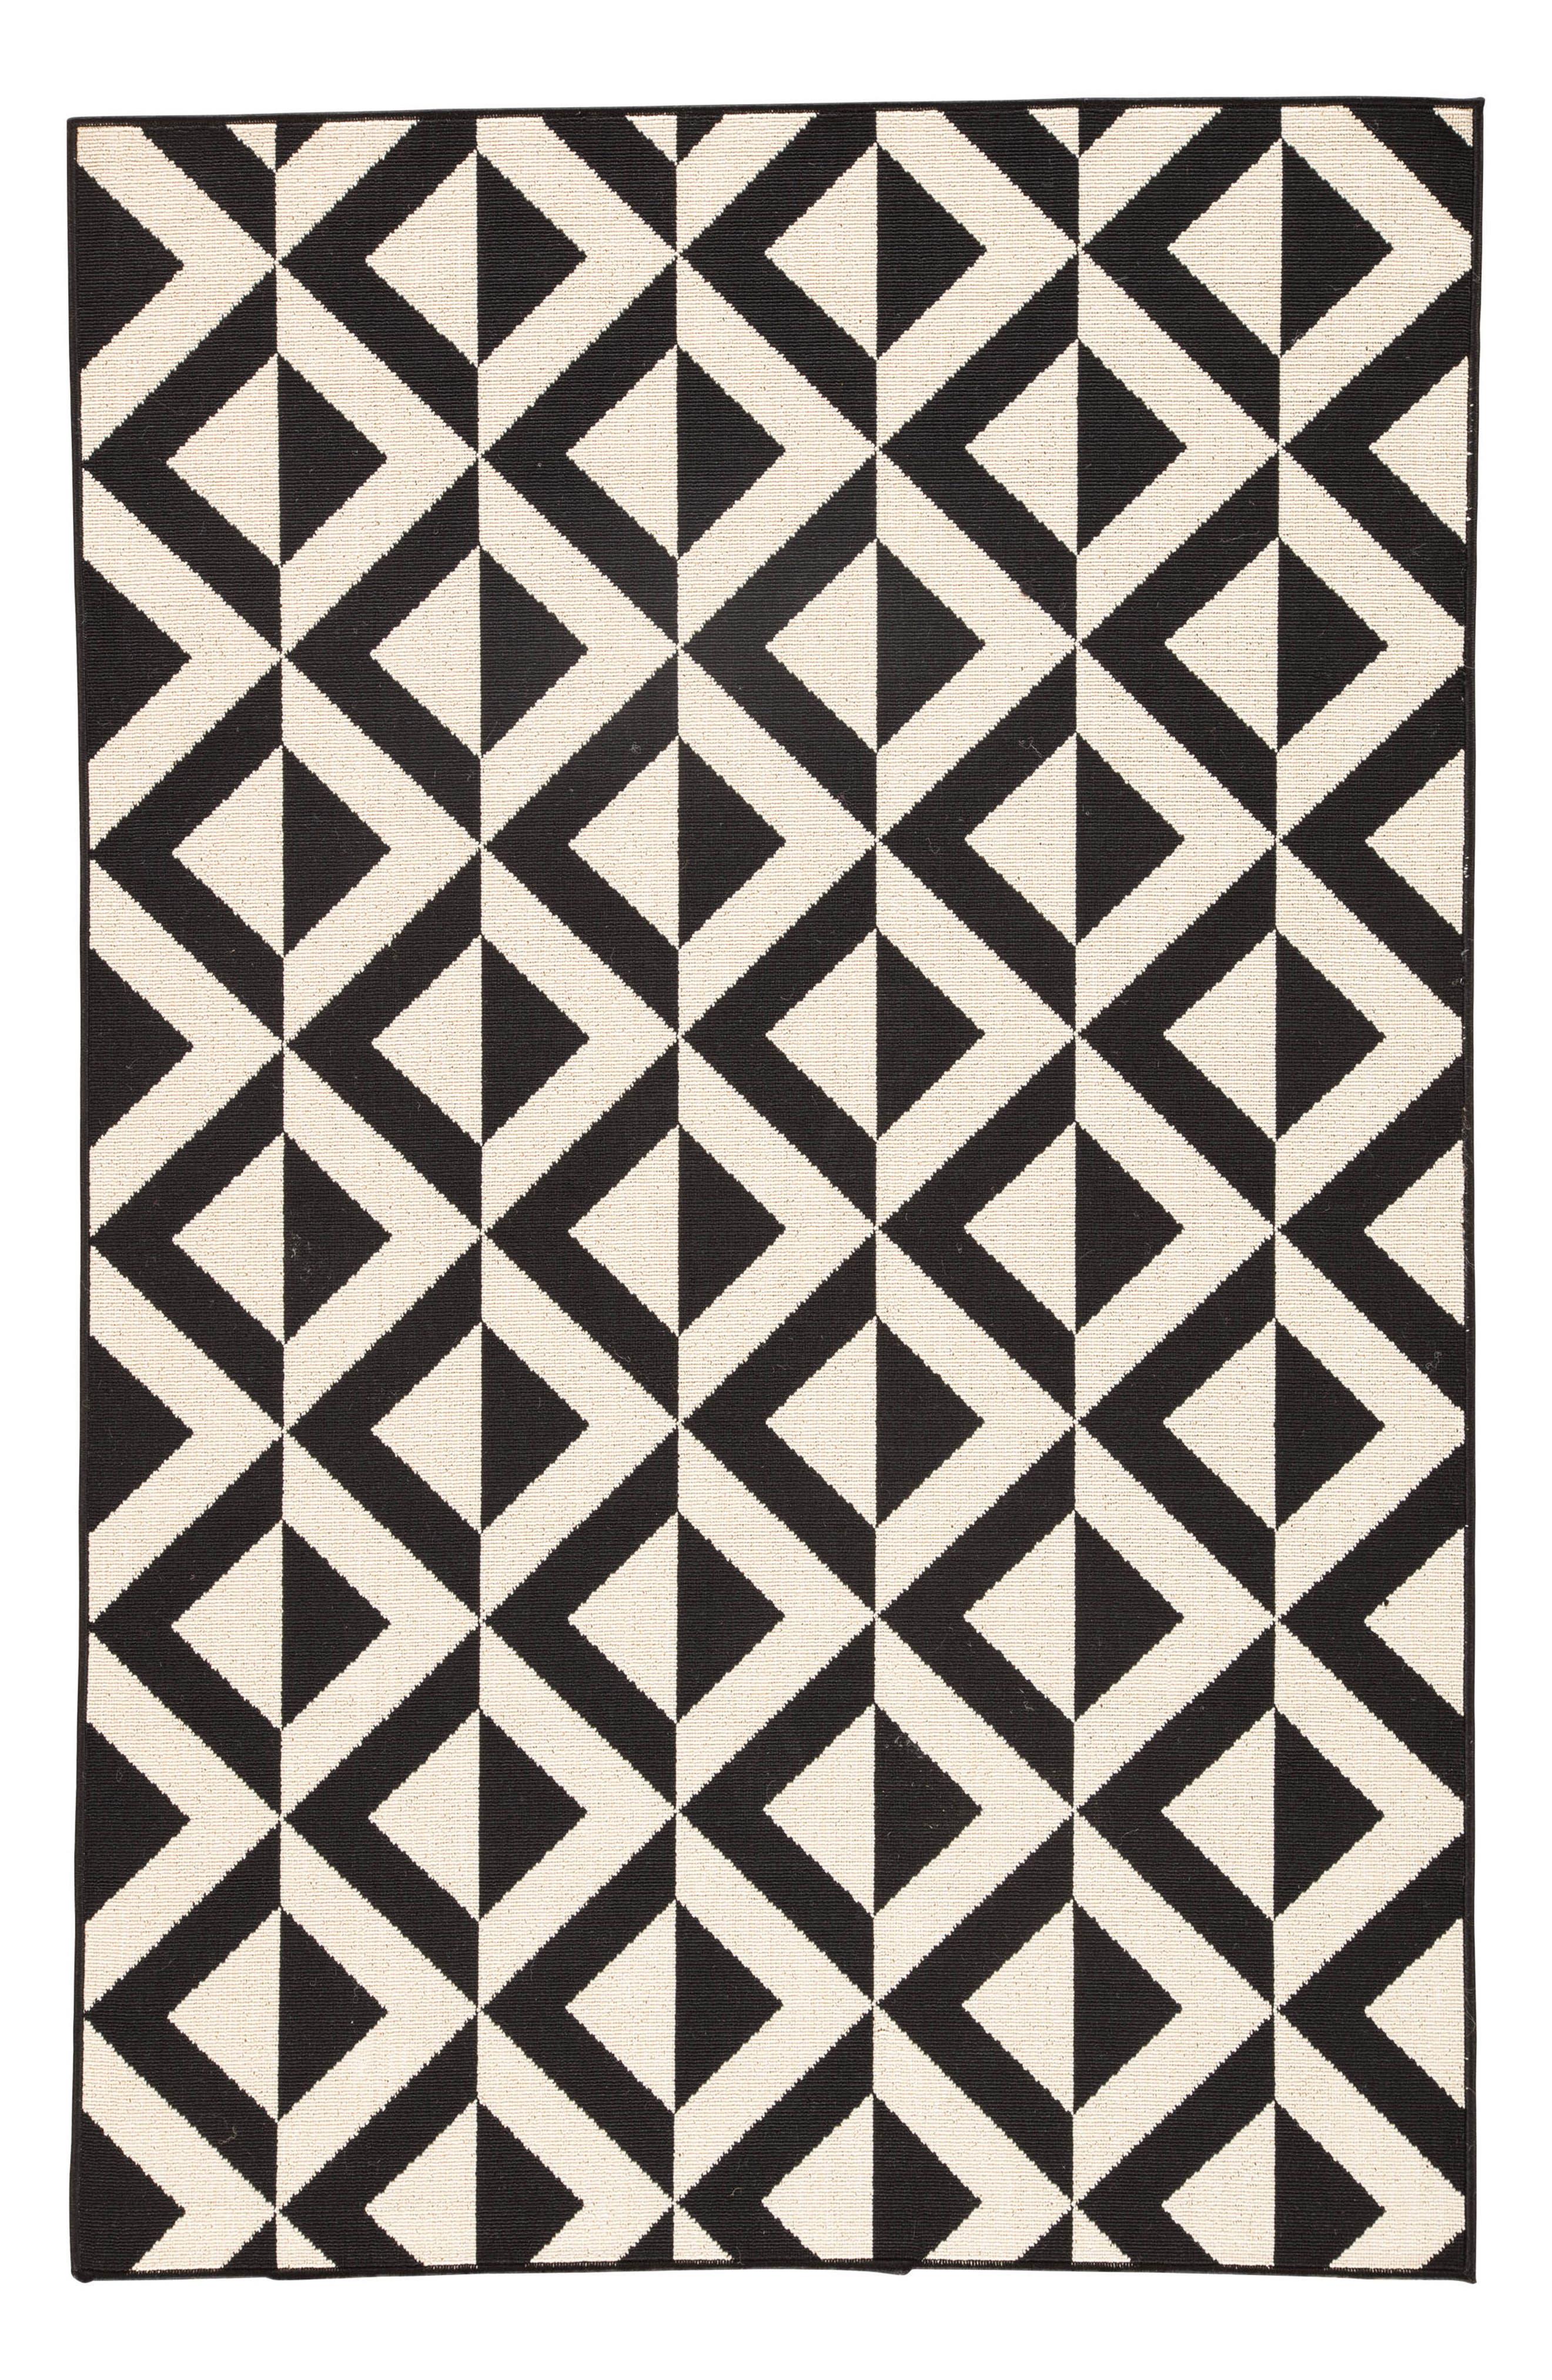 Main Image - Jaipur Geometric Pattern Rug